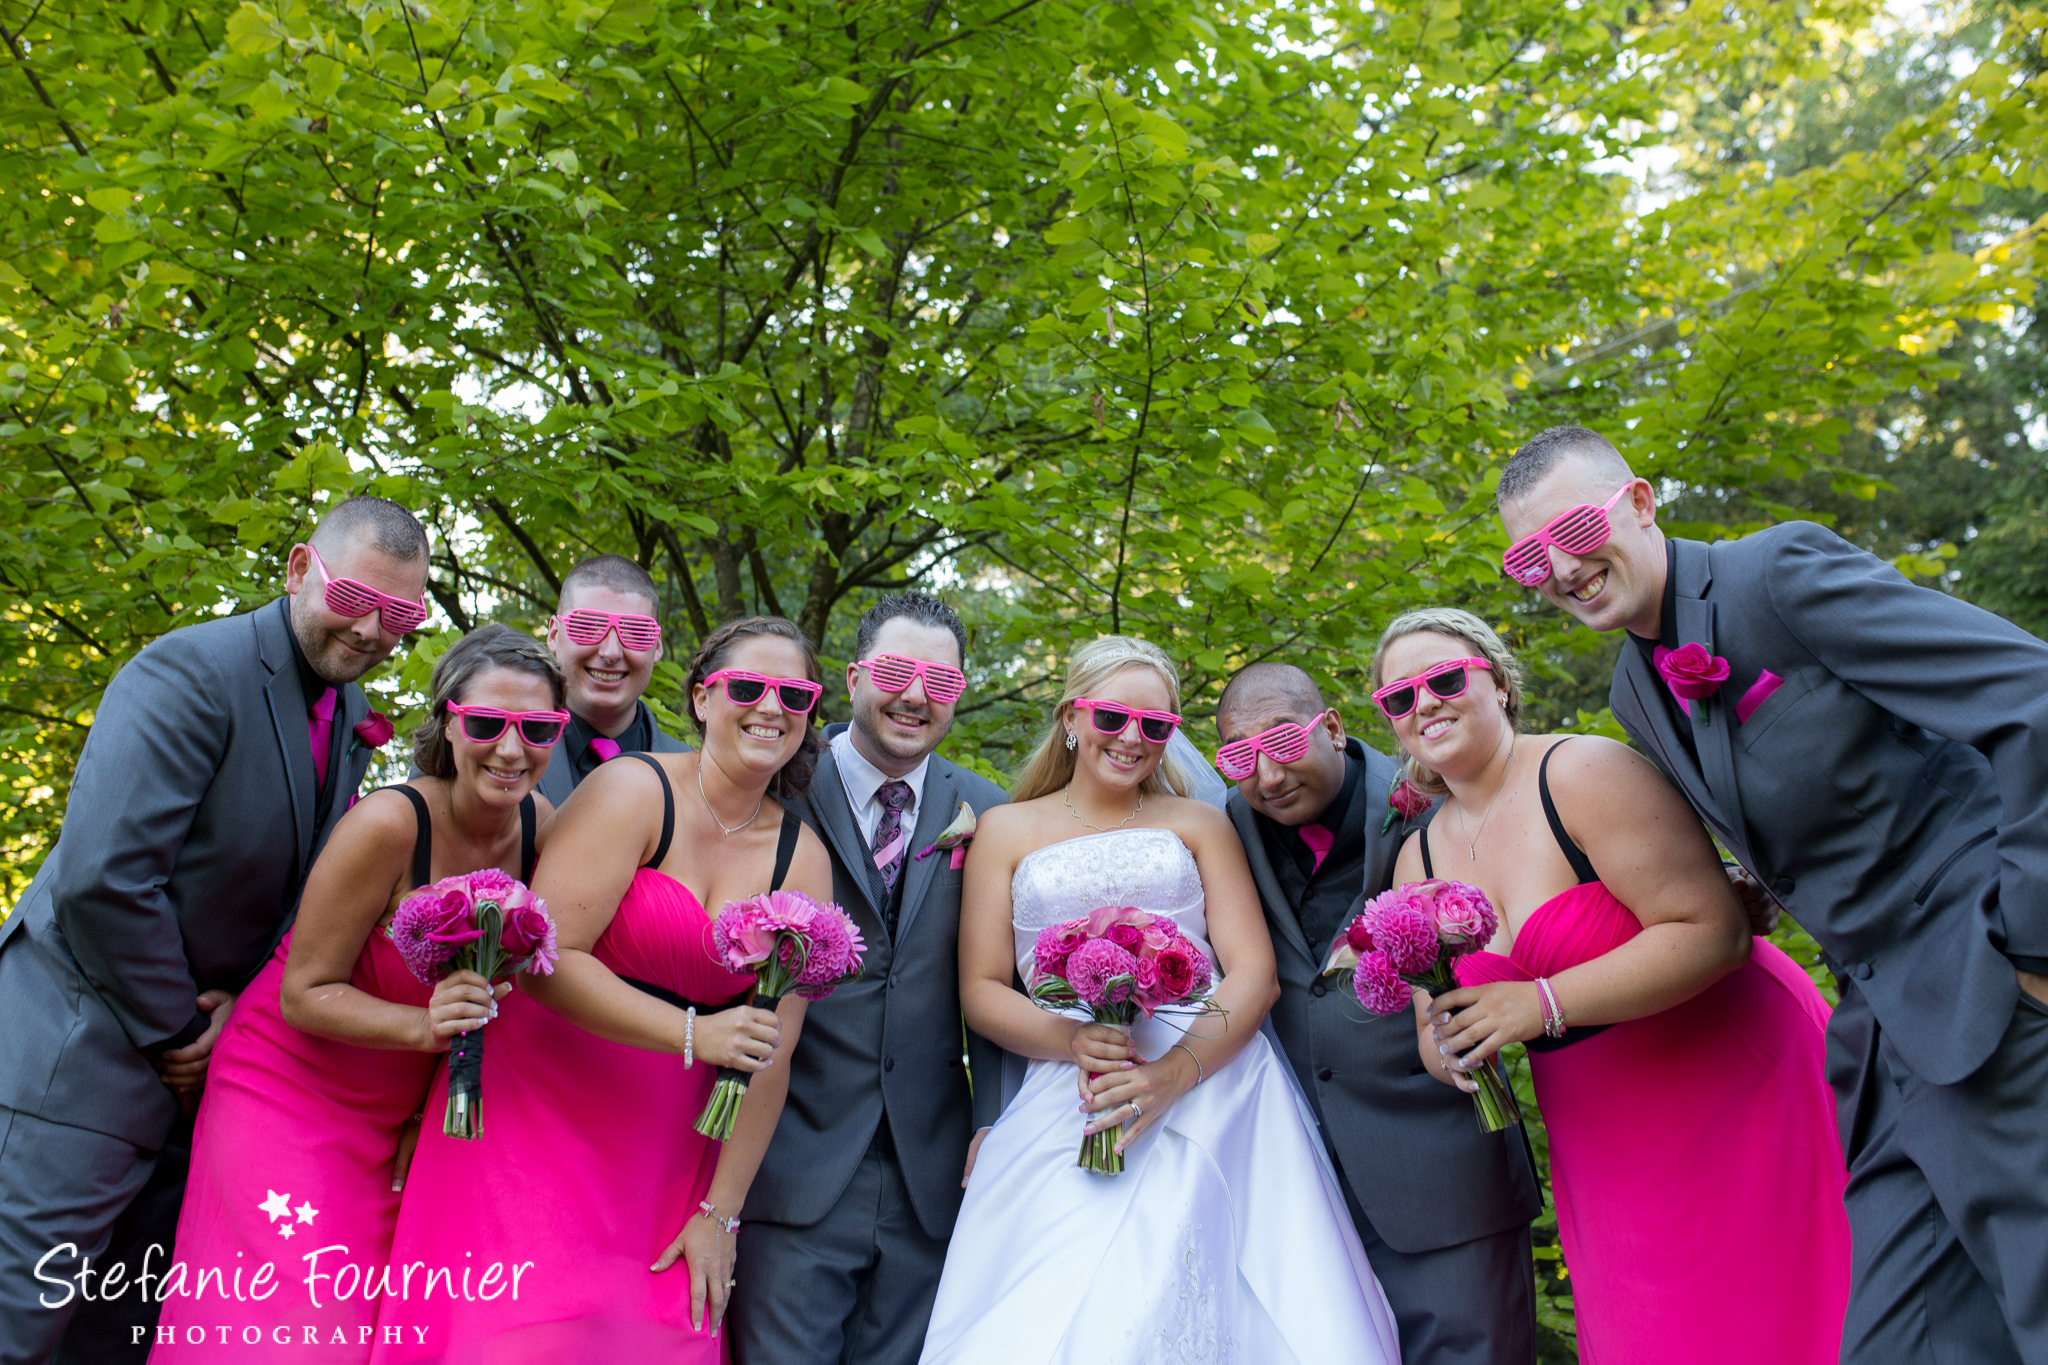 New West Wedding Photographer Stefanie Fournier Wedding Photographer Langley Victoria Vancouver